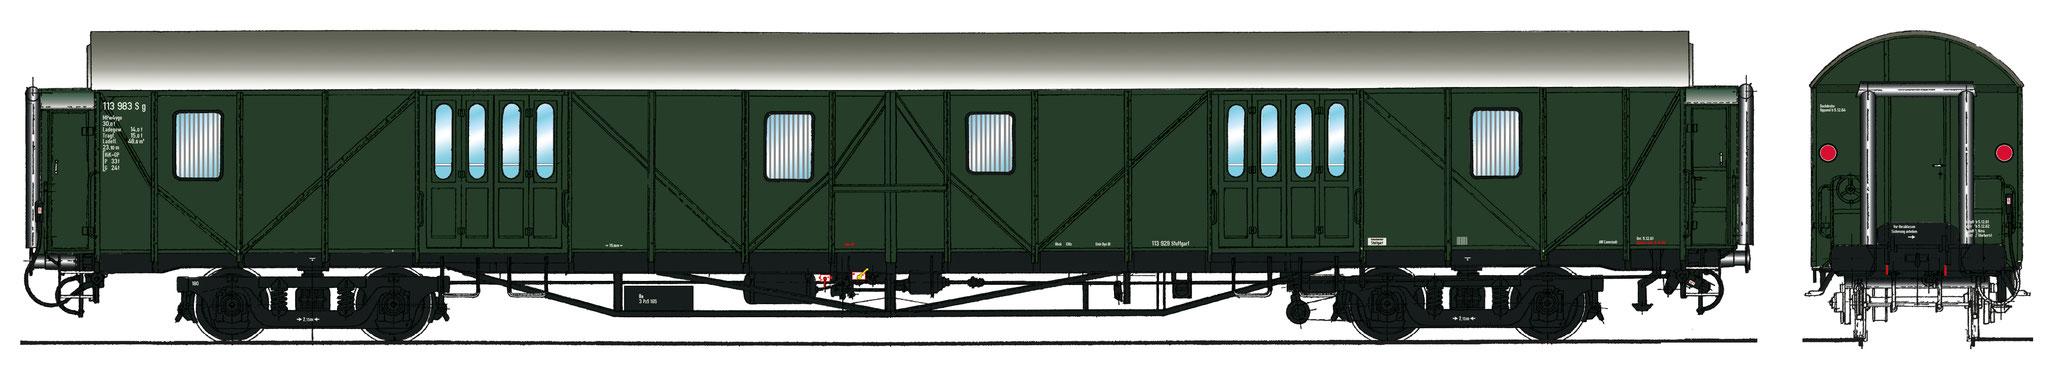 Spur 1 Gepäckwagen MPw4yg-57, Epoche IIIb (Colorierung der Bestell-Nr. 16047)